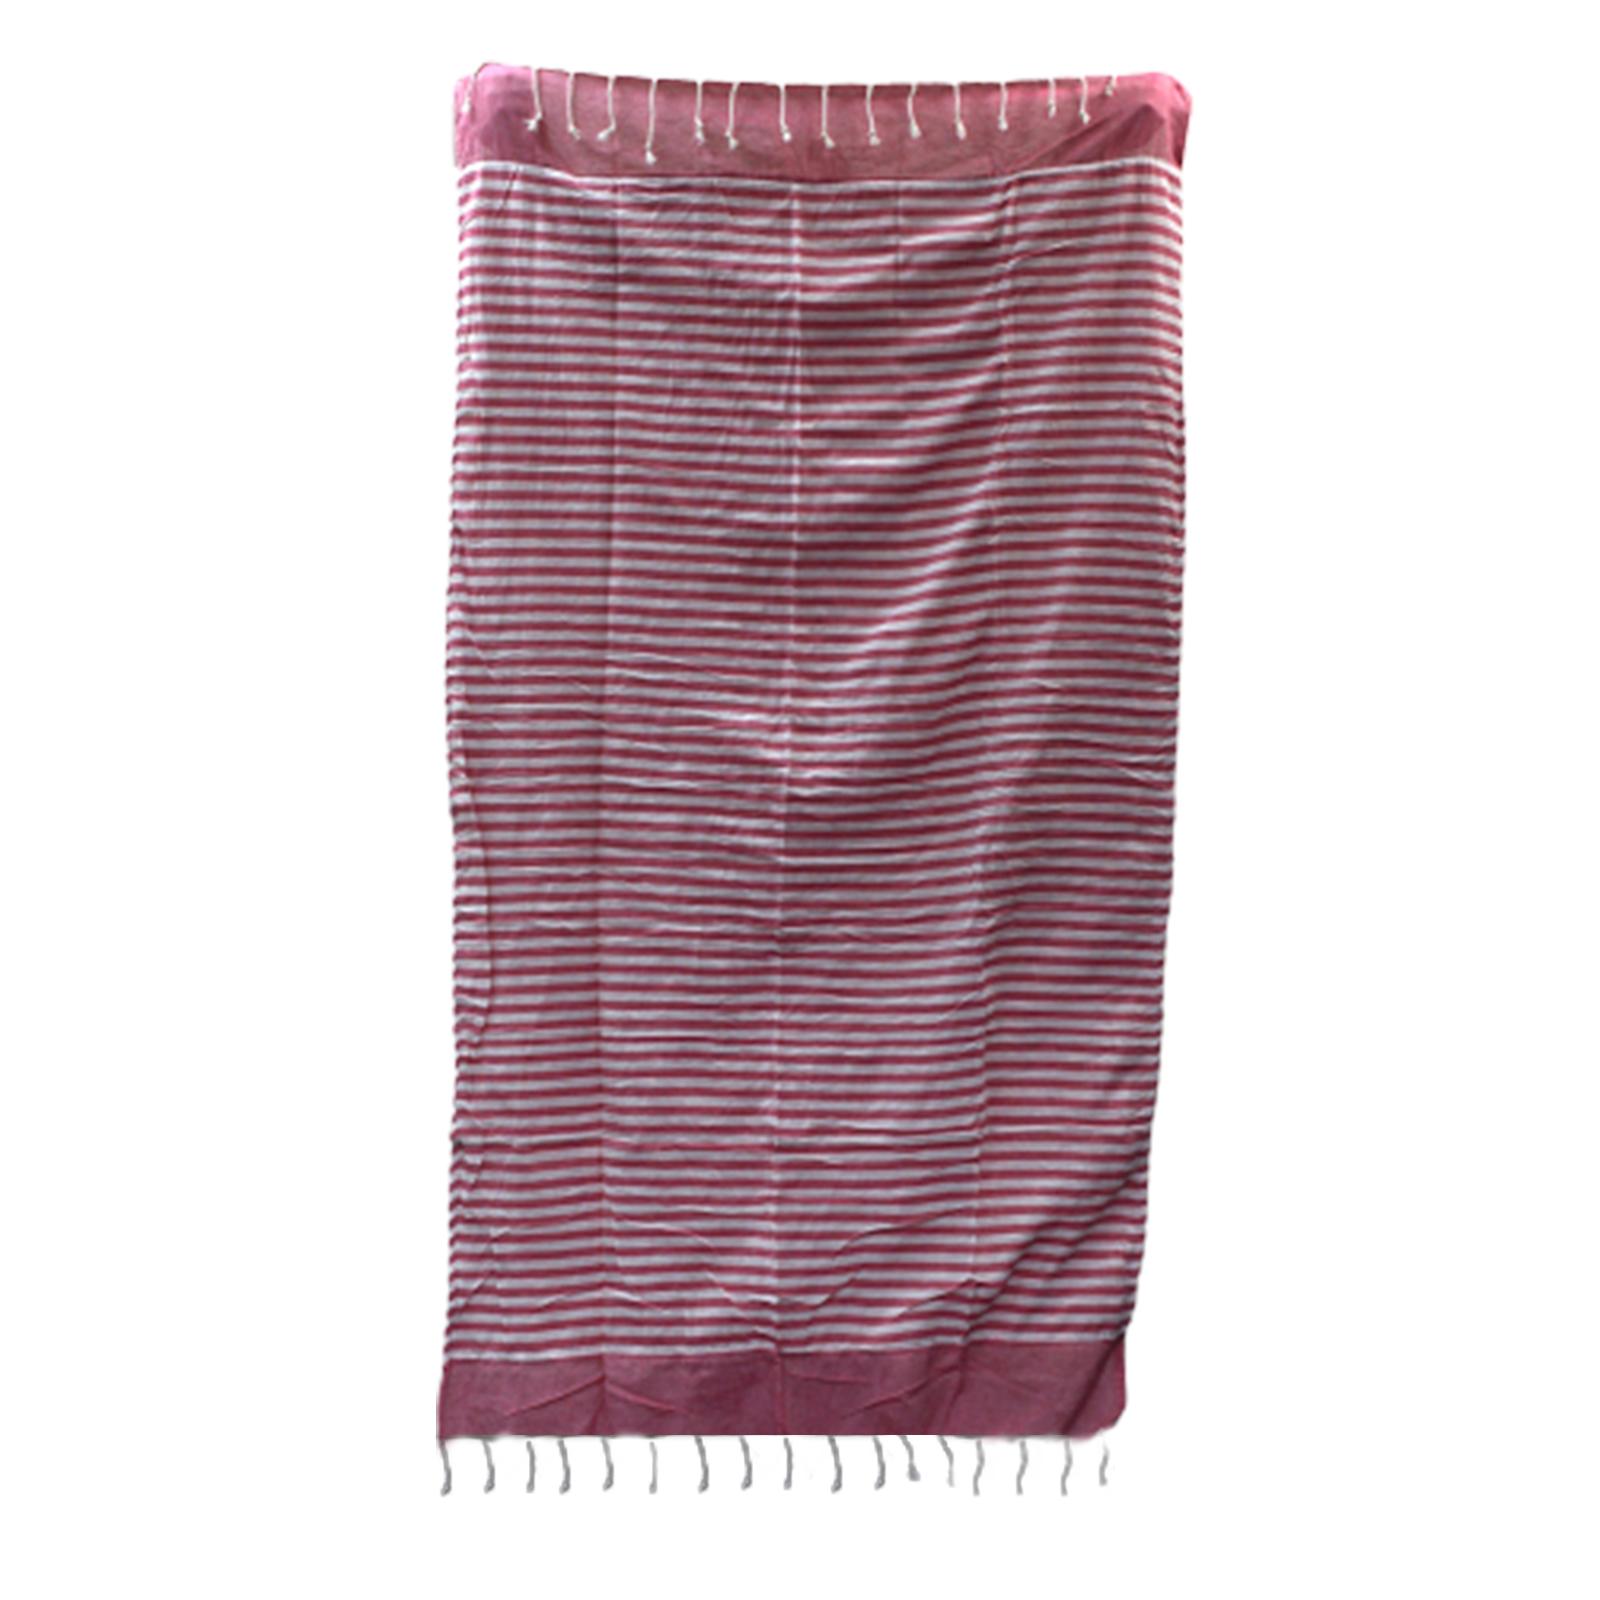 Cotton Pario Throw 100x180 cm Hot Pink